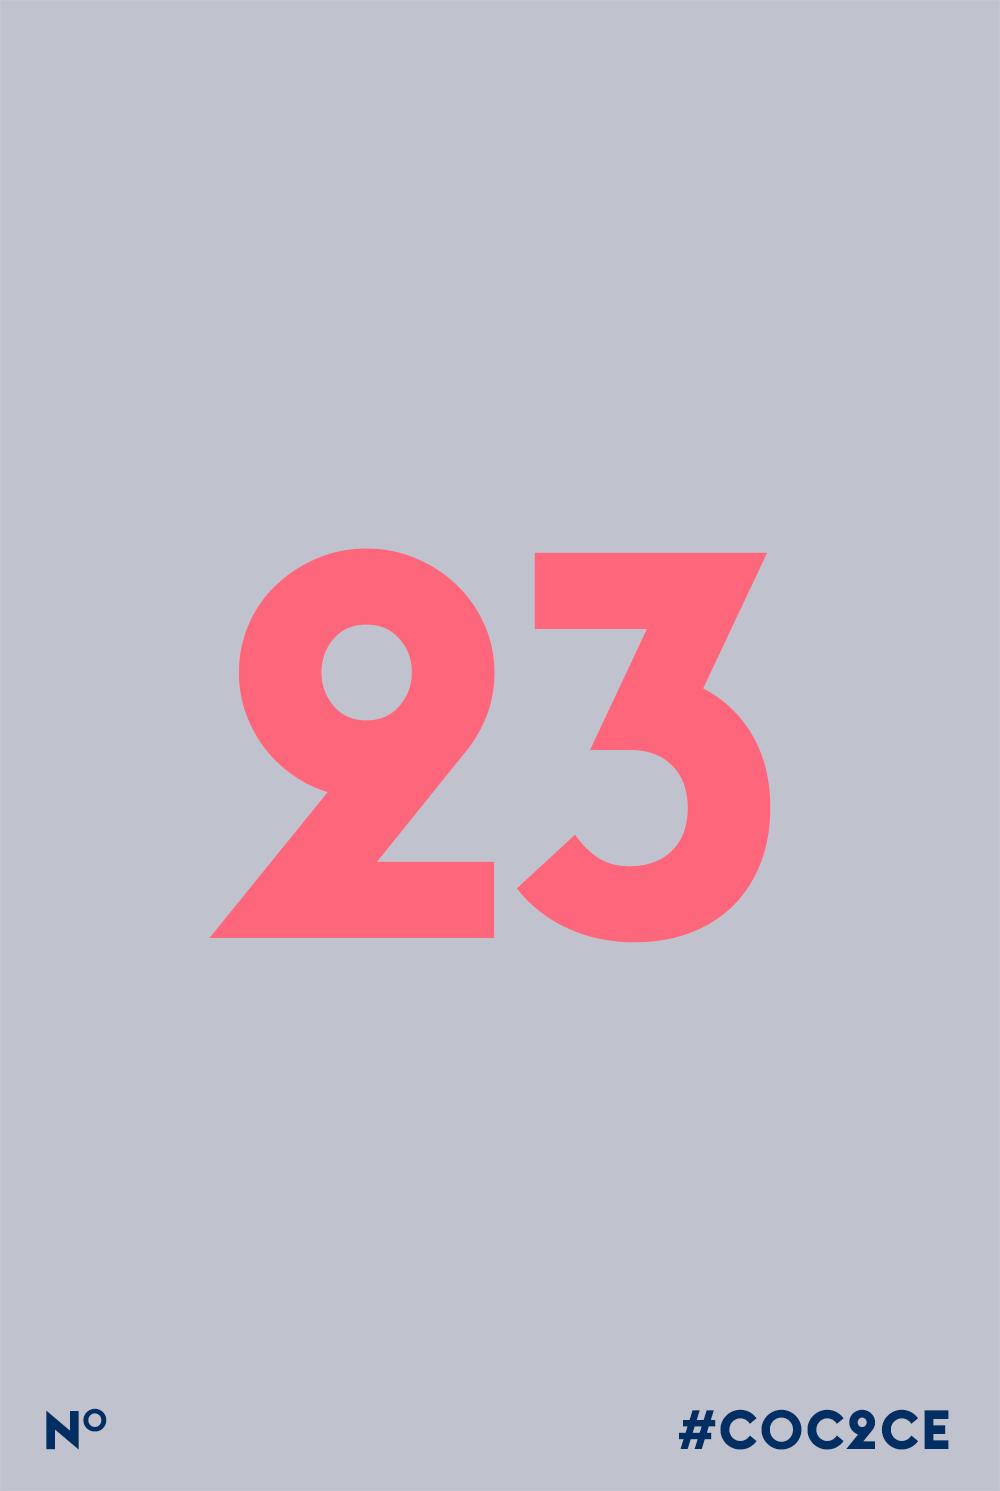 cc_0022_23